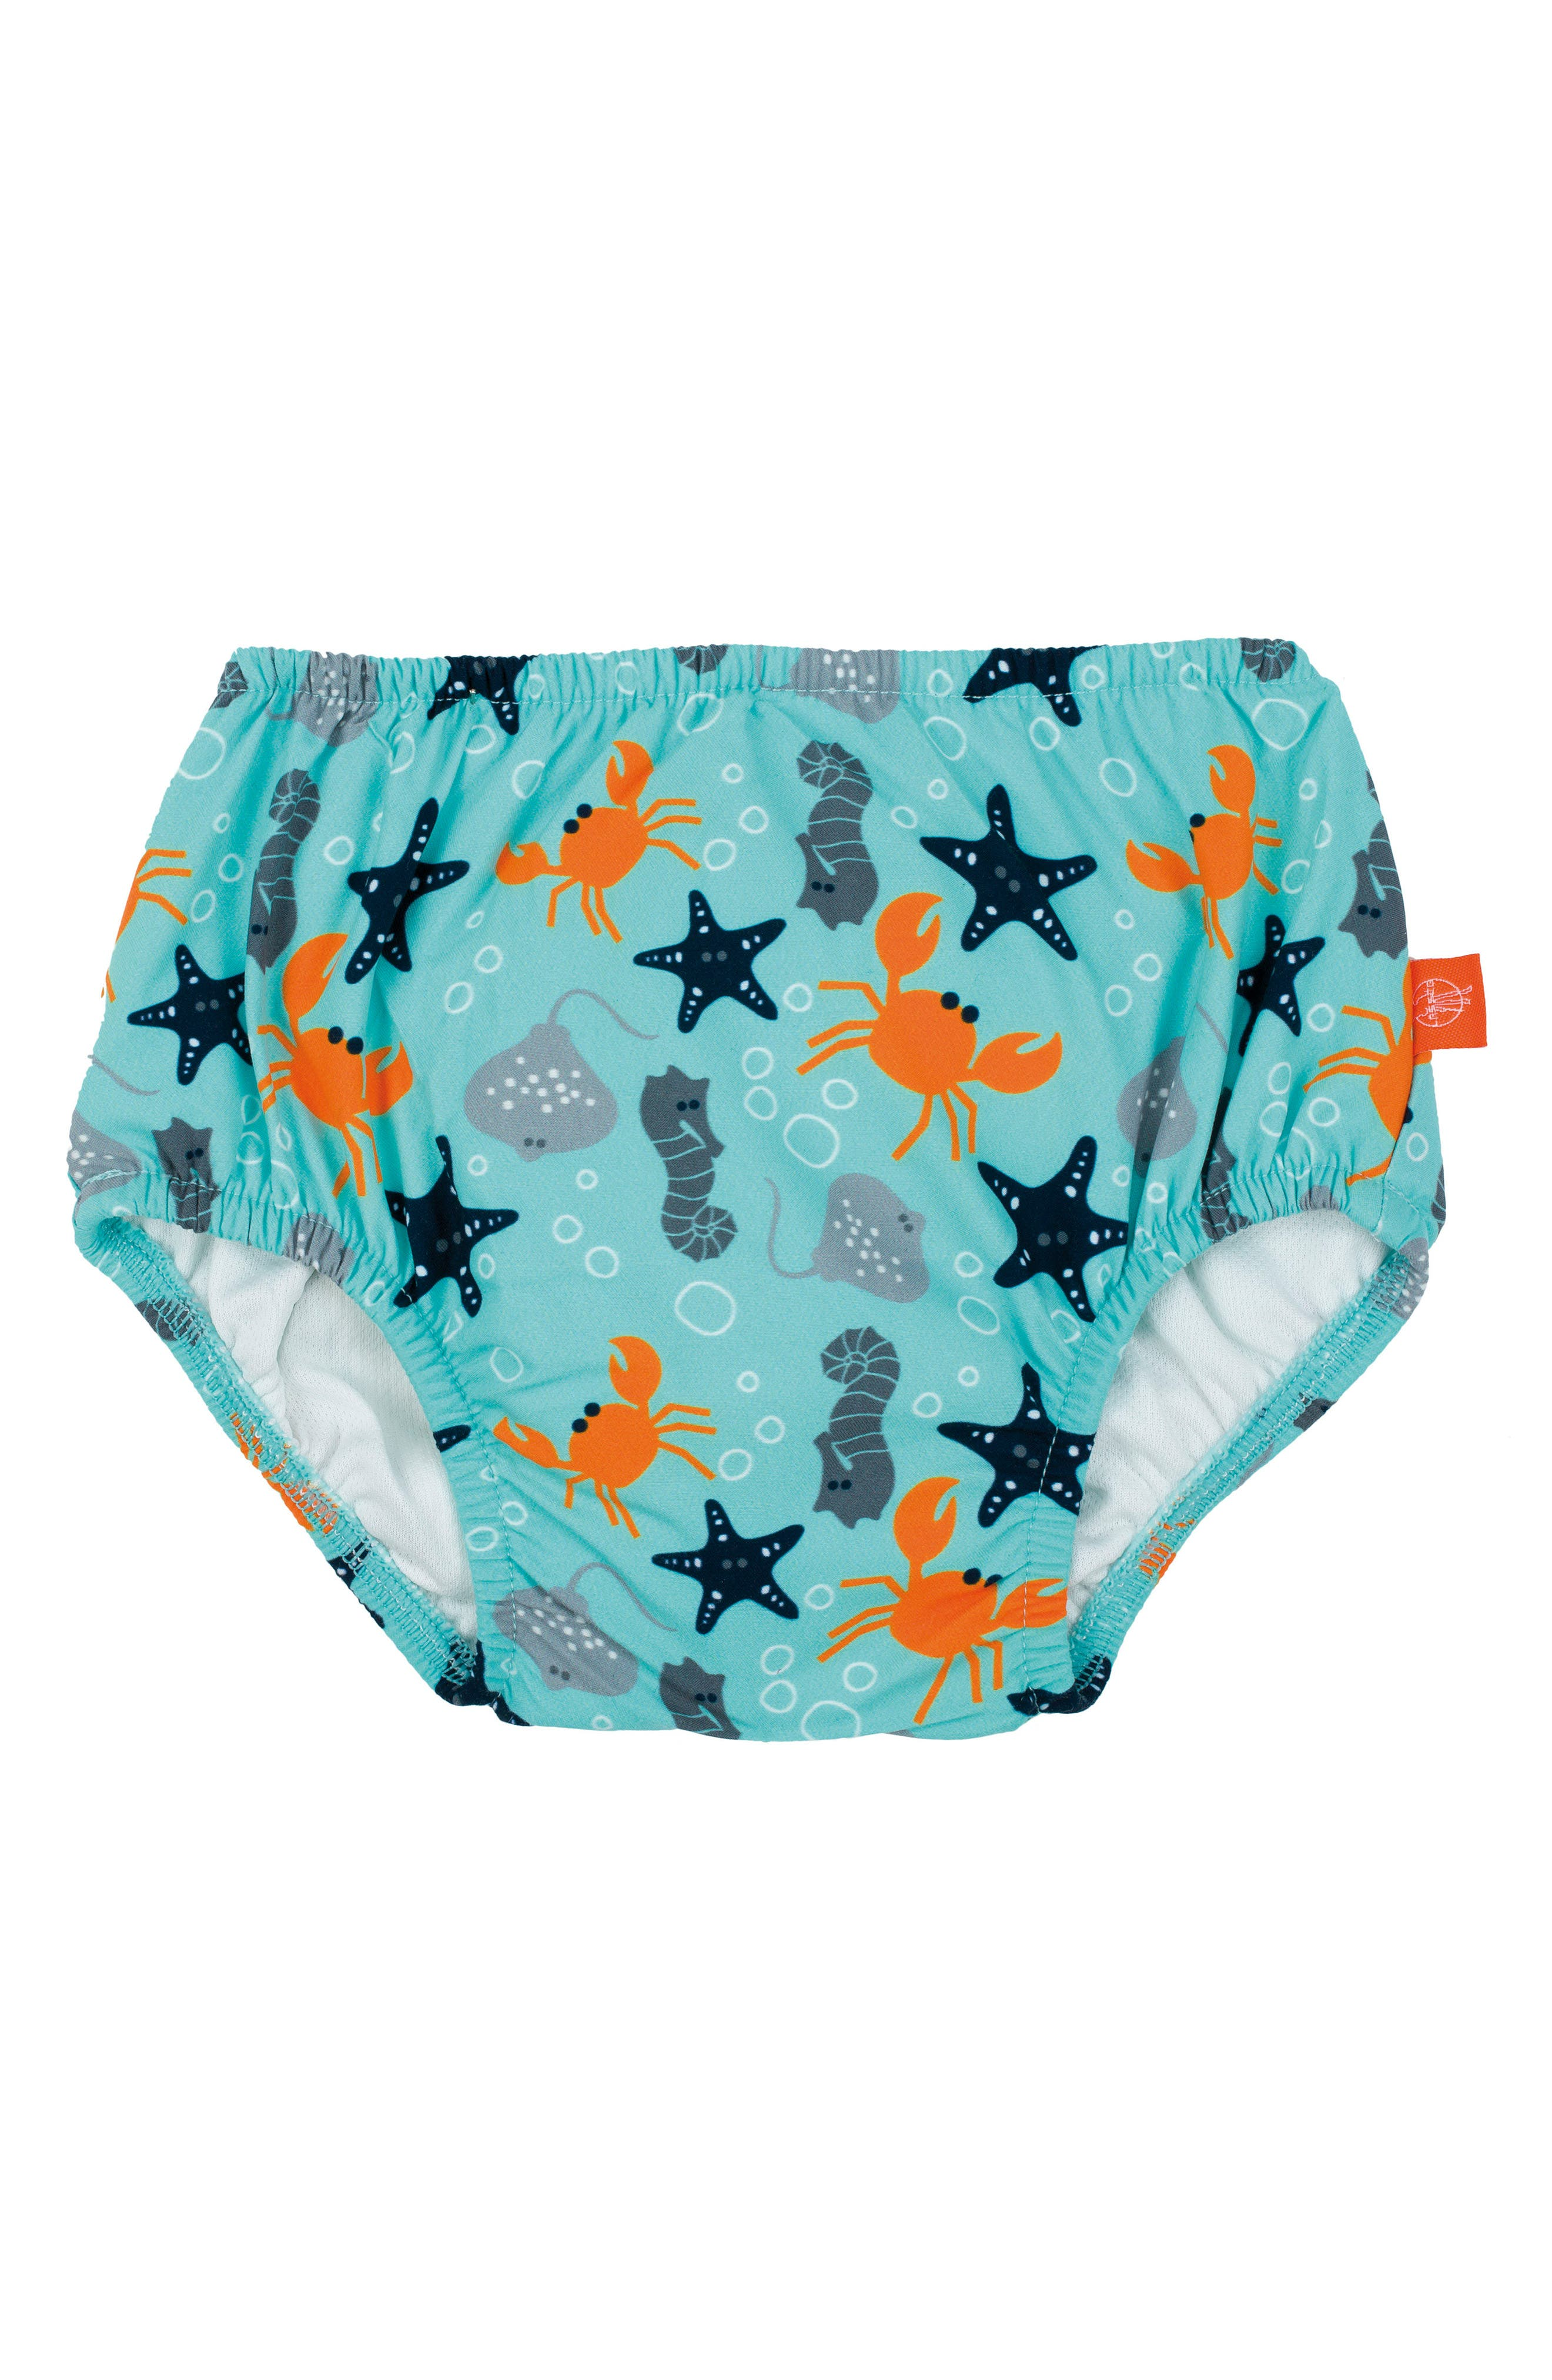 Star Fish Swim Diaper Cover,                         Main,                         color, Light Blue Orange Grey Navy